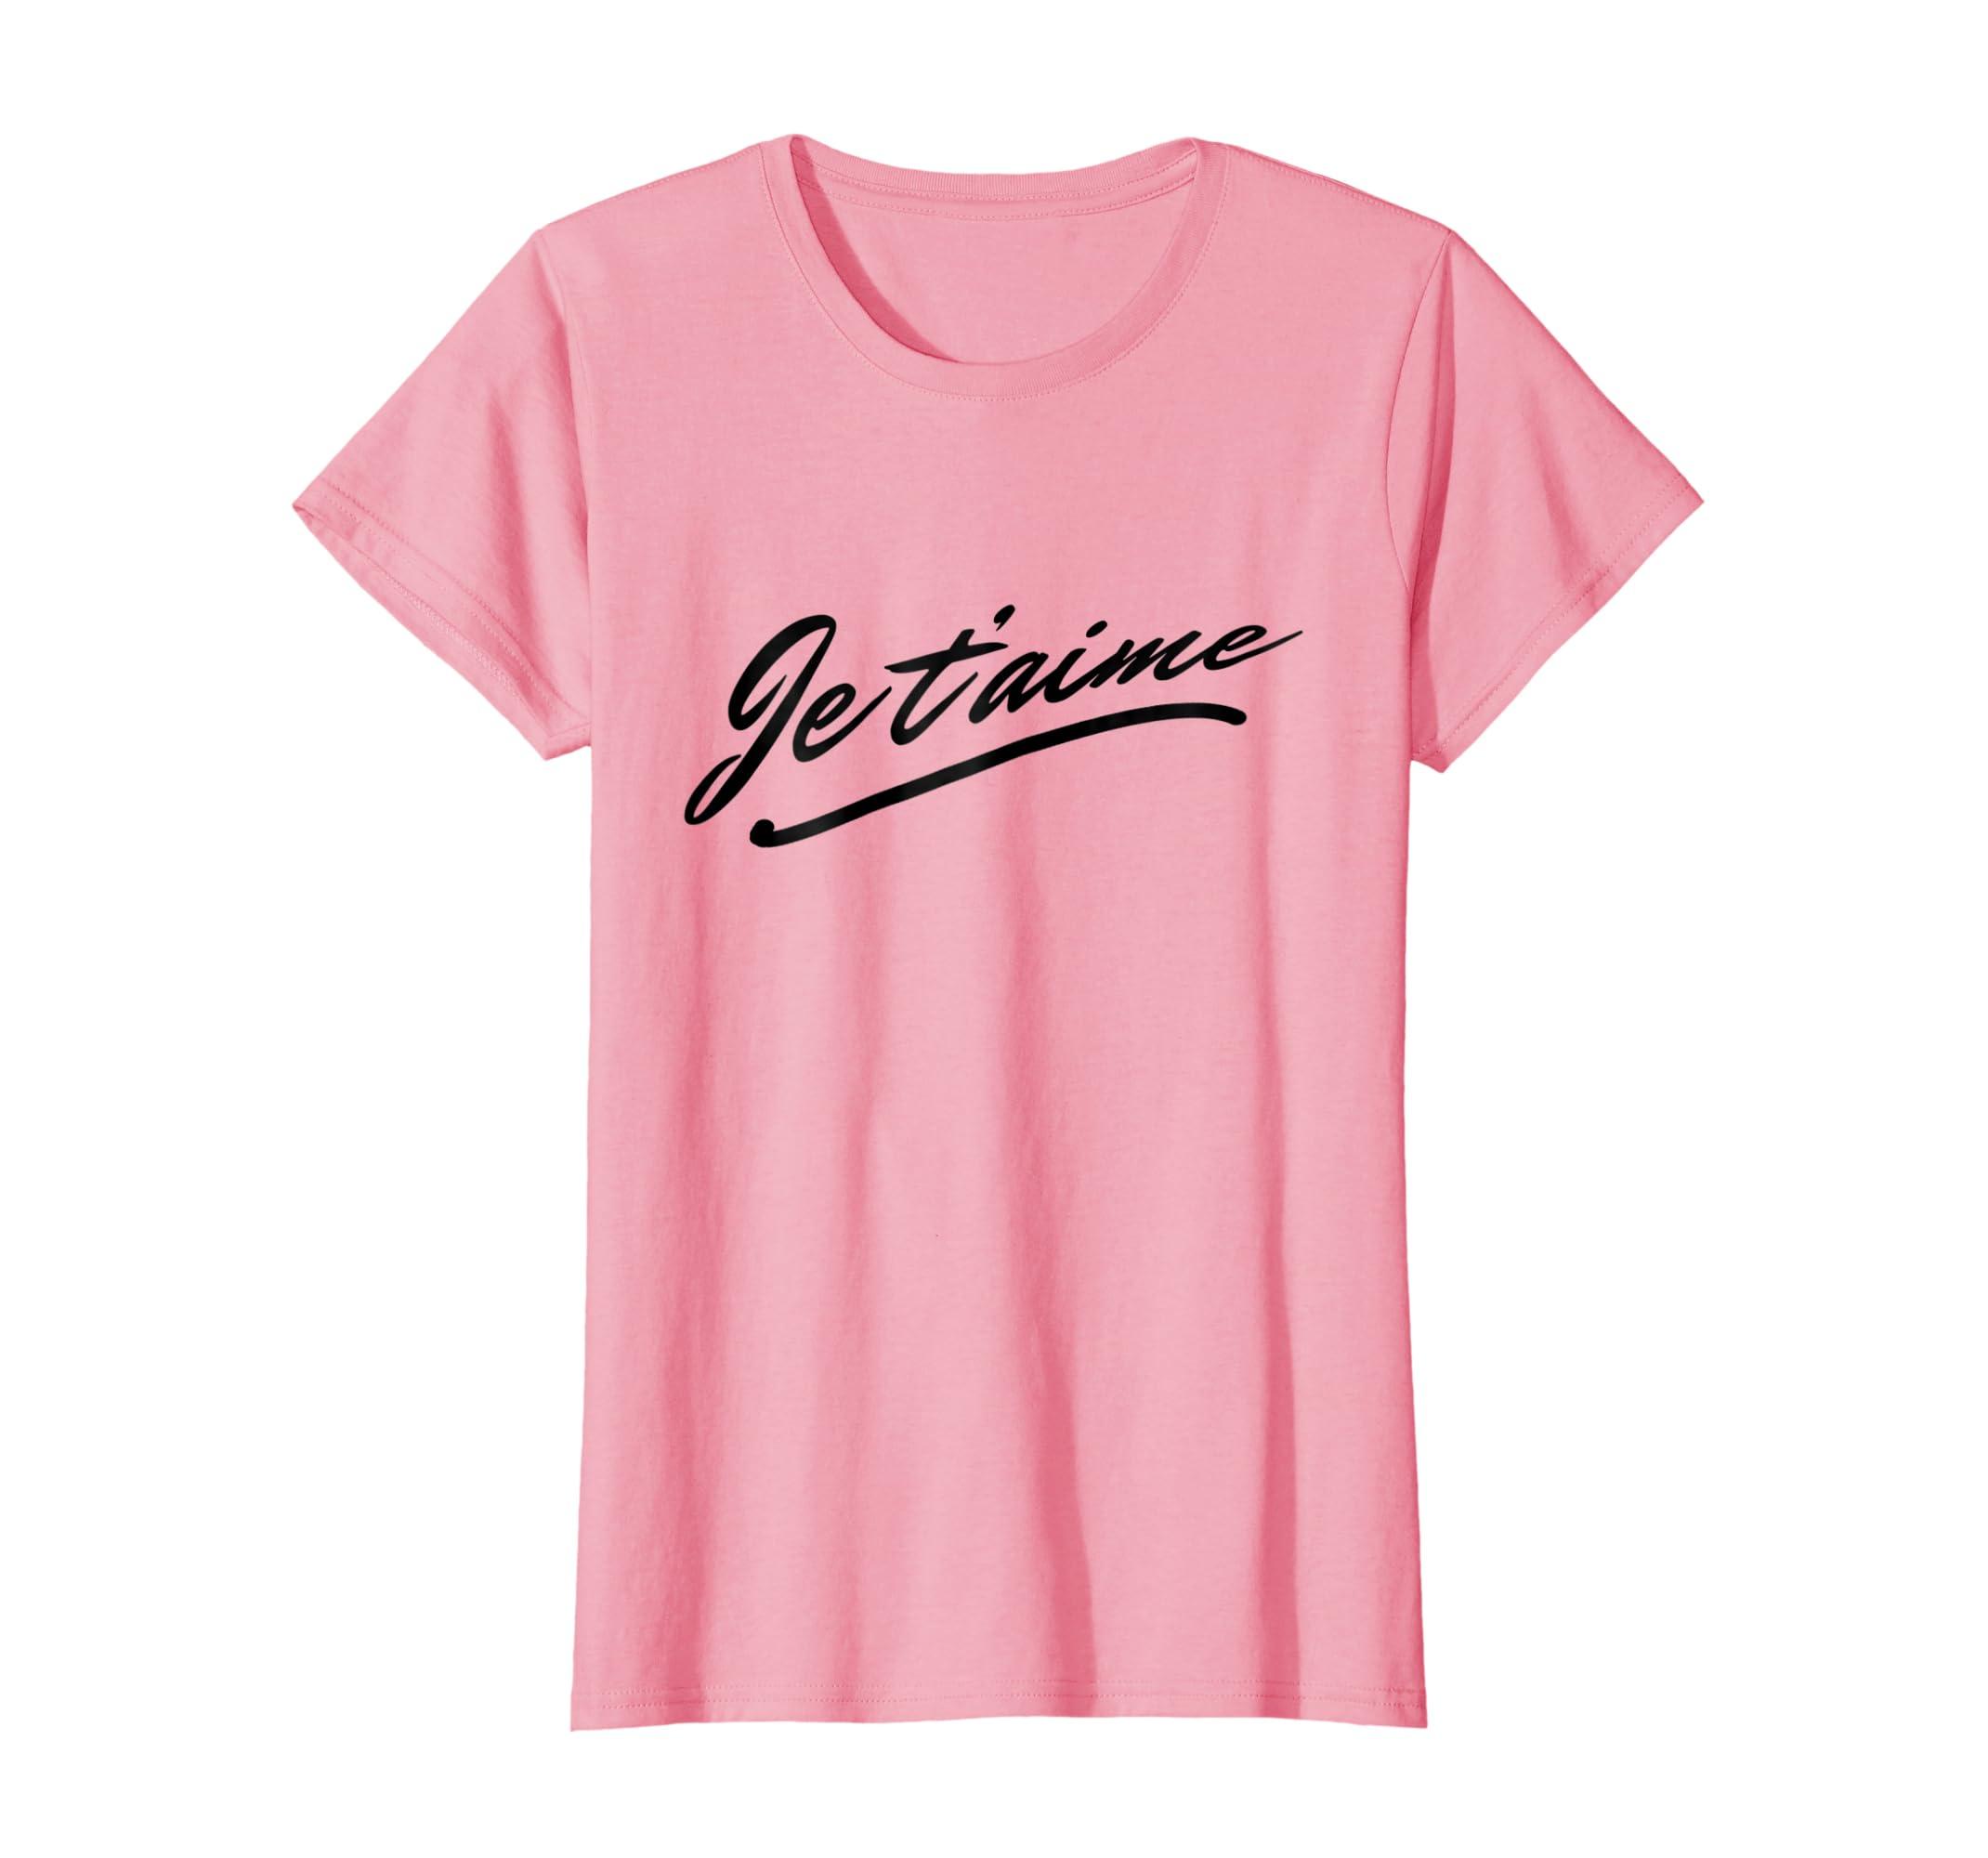 6575dbf2162150 Amazon.com  Je T aime T-Shirt - I Love You Women Men French Language   Clothing